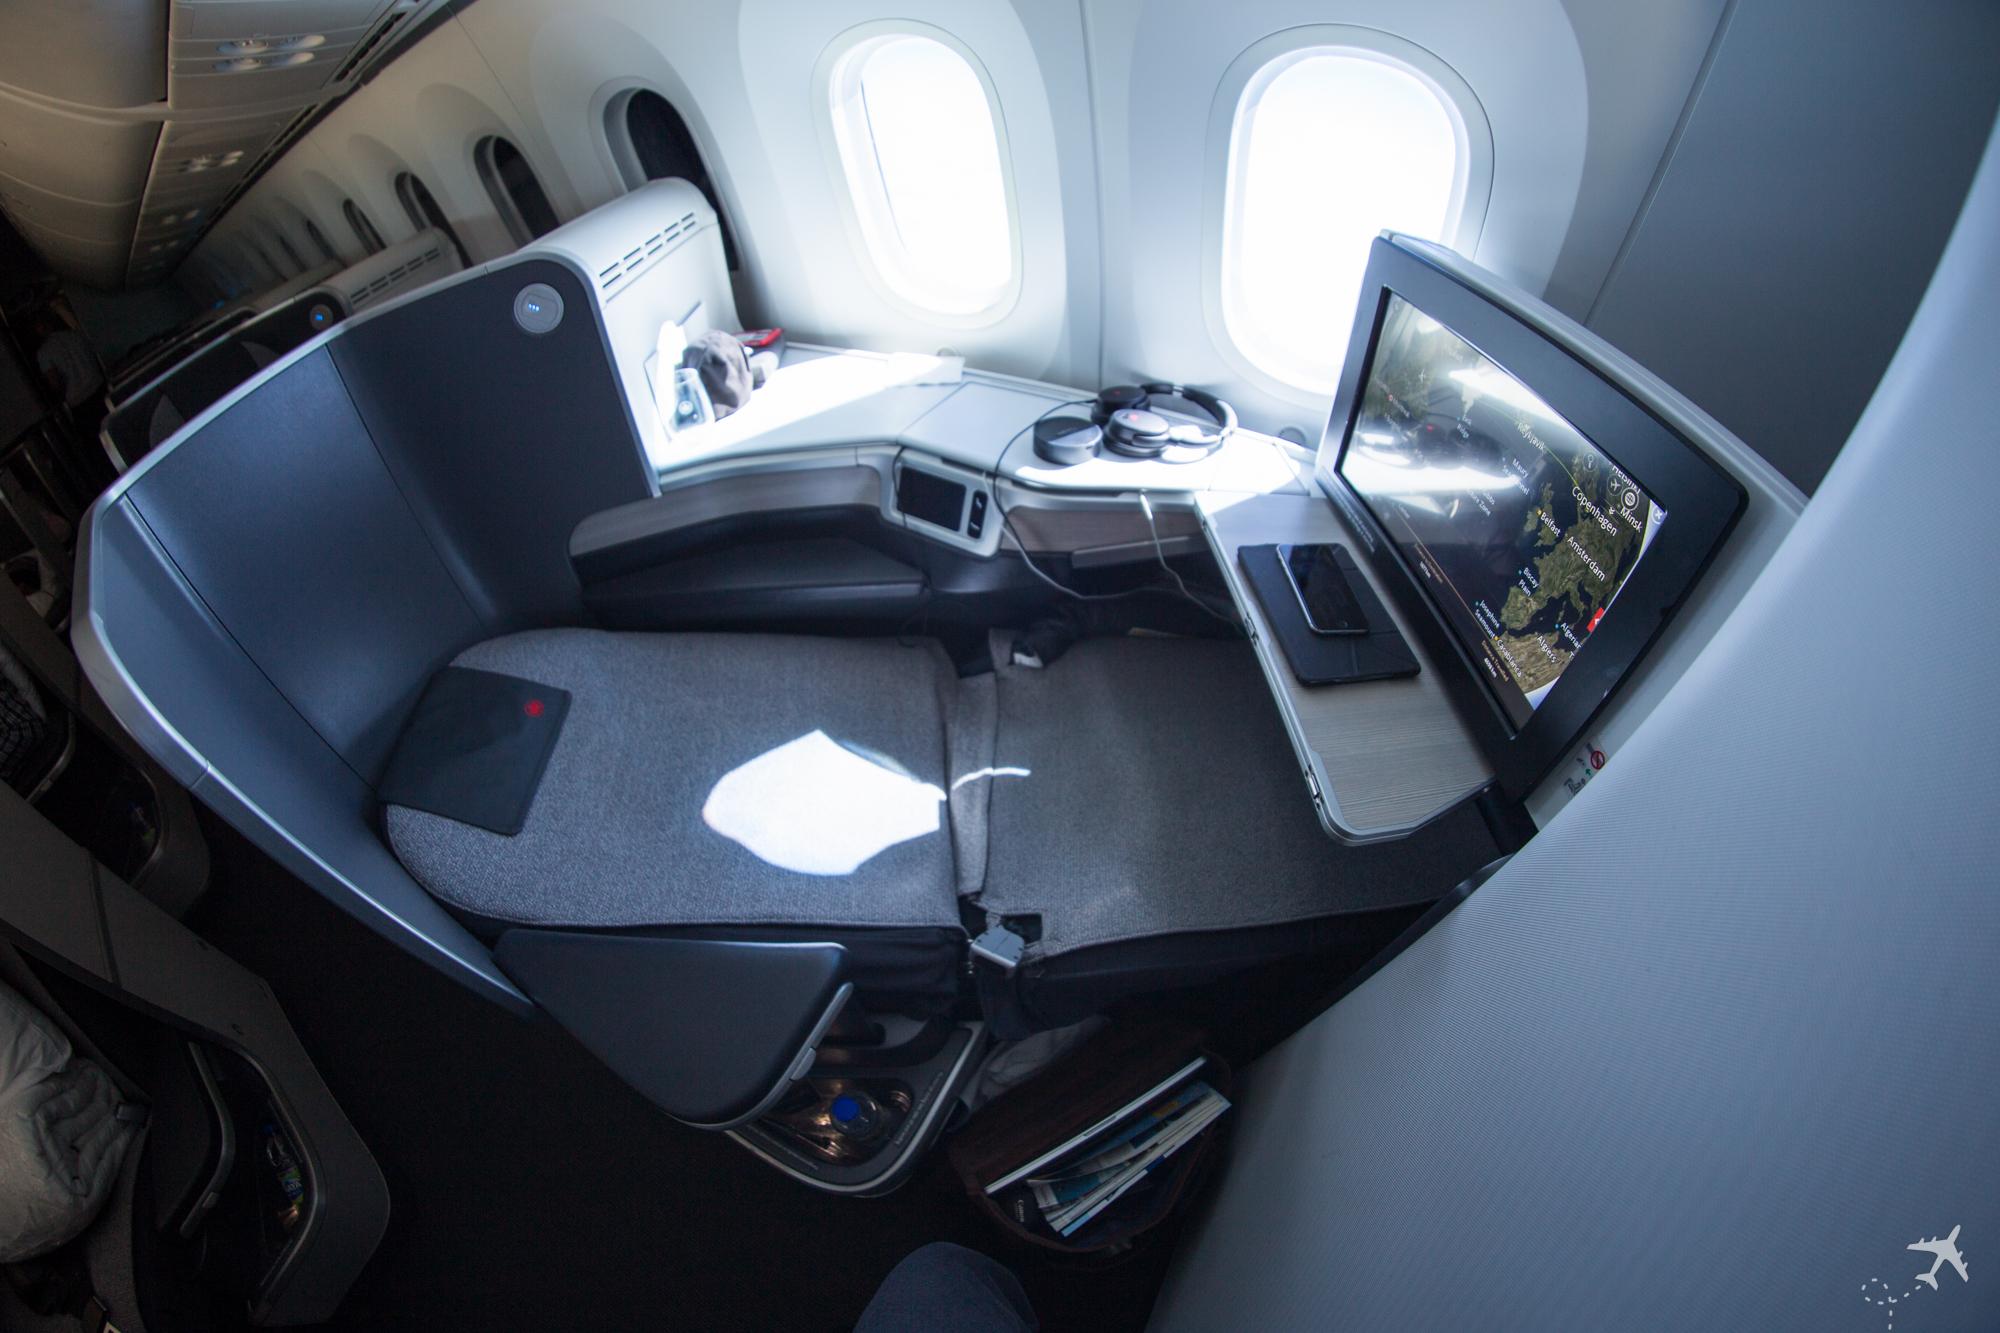 Air Canada Boeing 787-9 Business Class Lie-flat